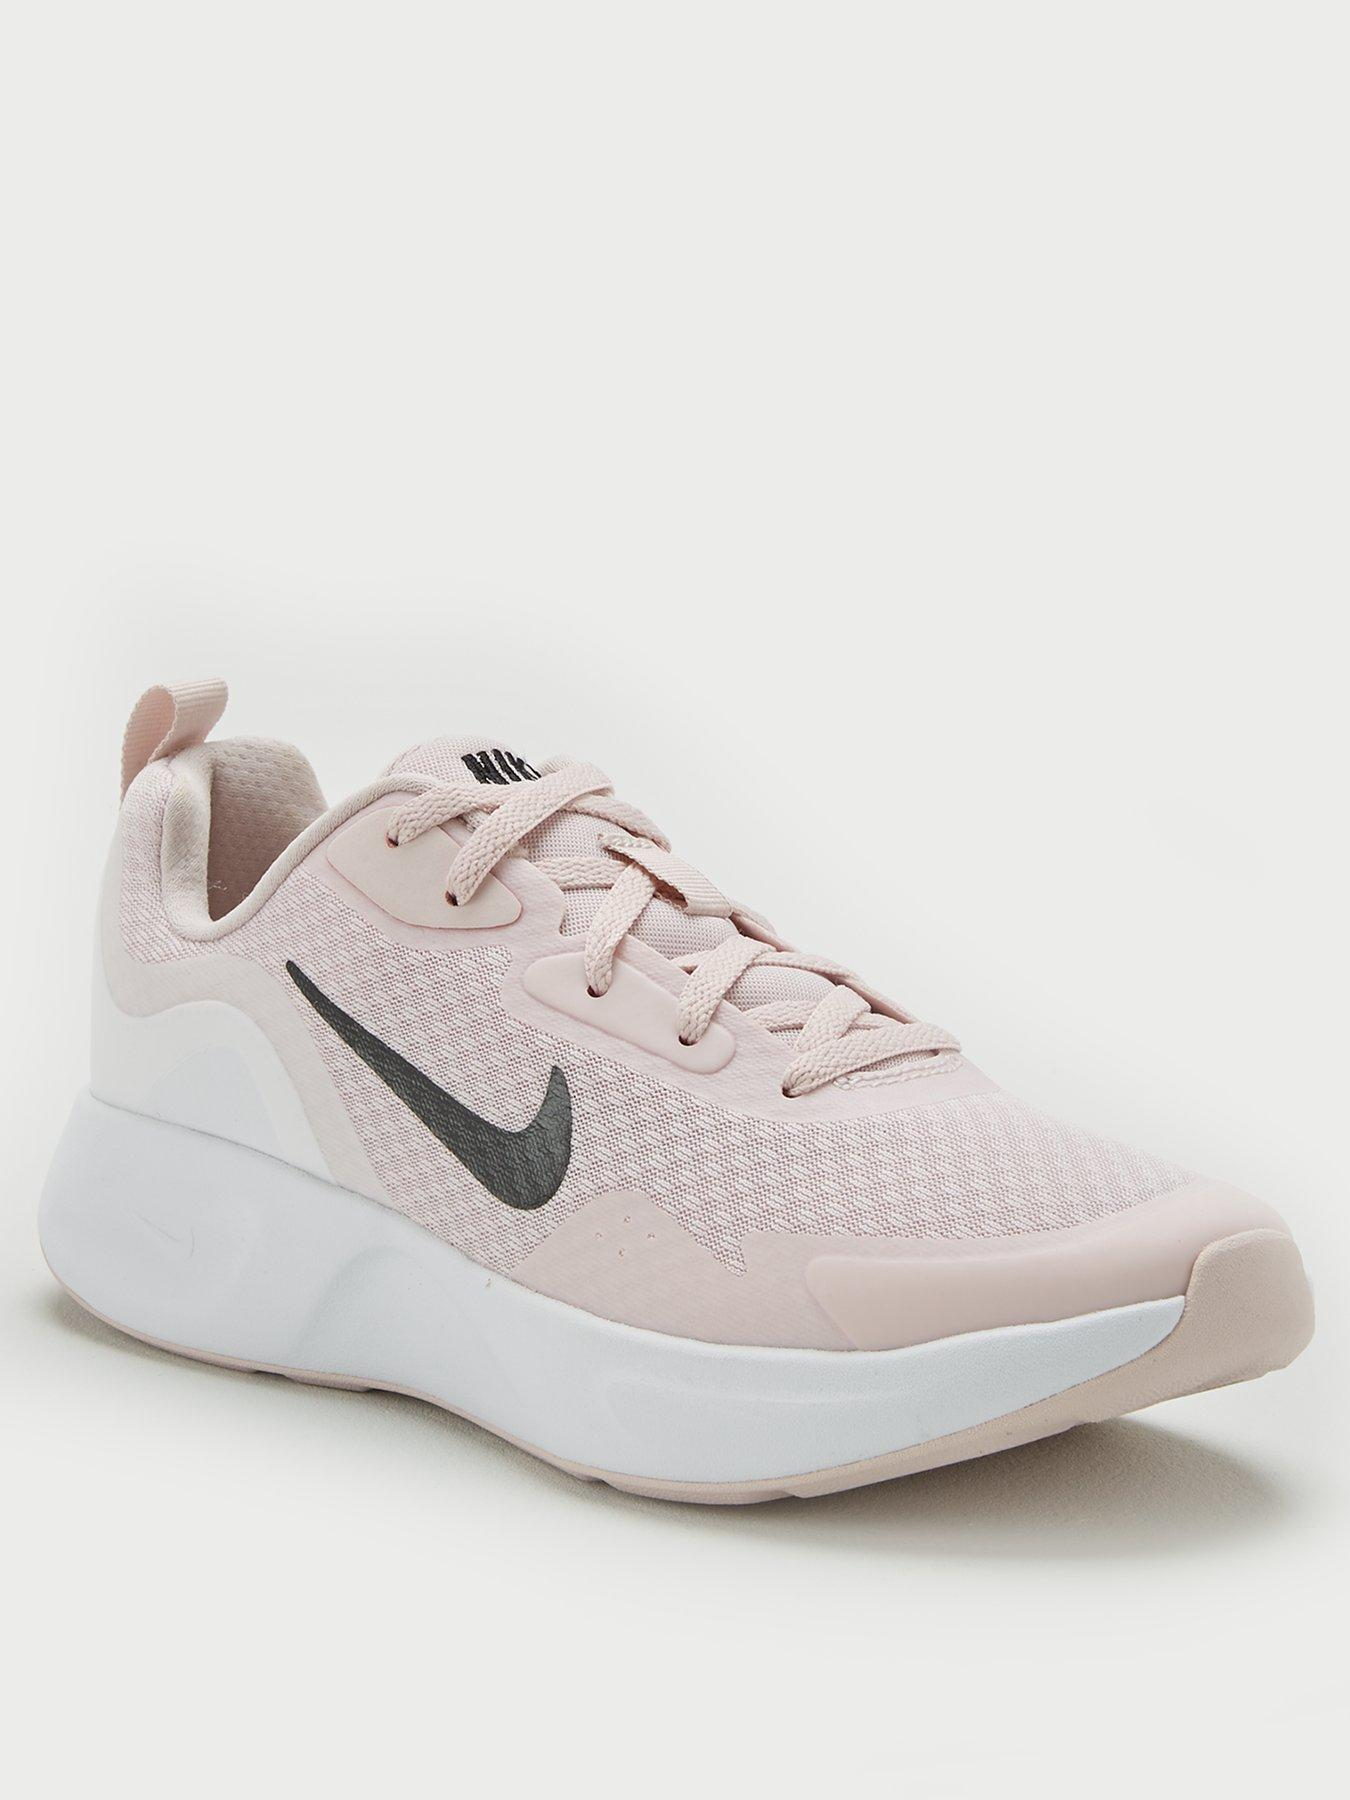 Womens Nike Trainers | Ladies Nike